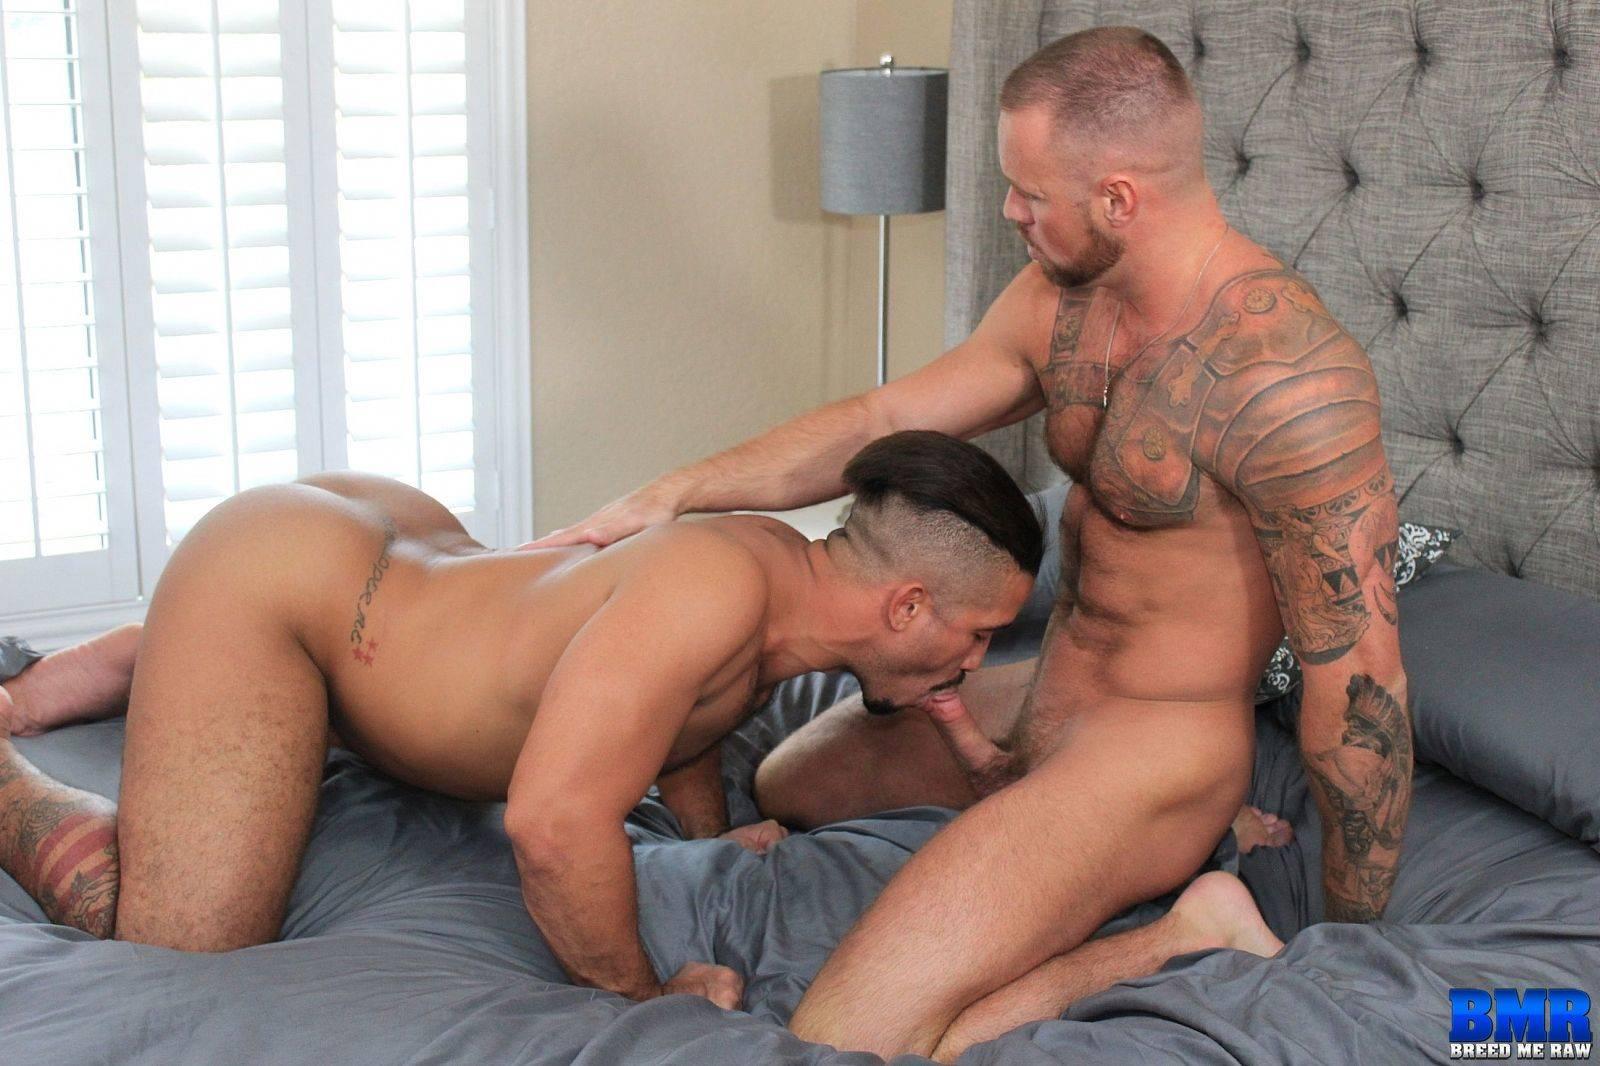 Michael Roman and Trey Turner